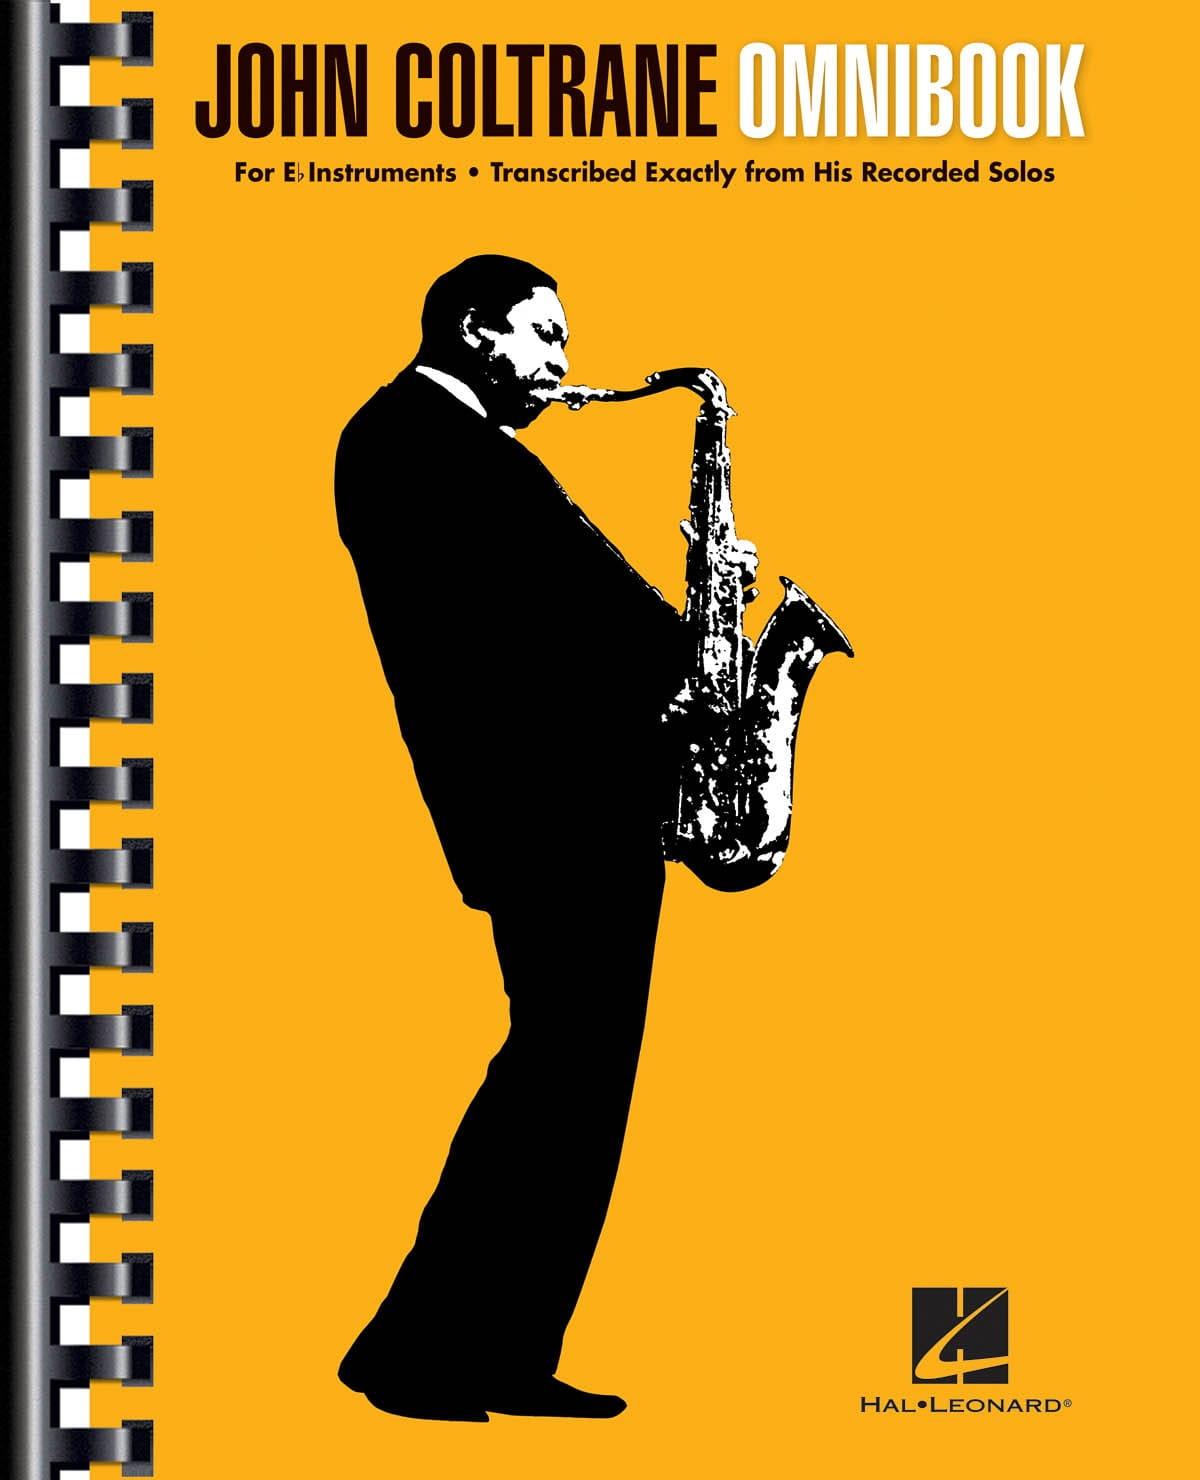 John Coltrane - Omnibook pour instrument en mib - Partition - di-arezzo.fr